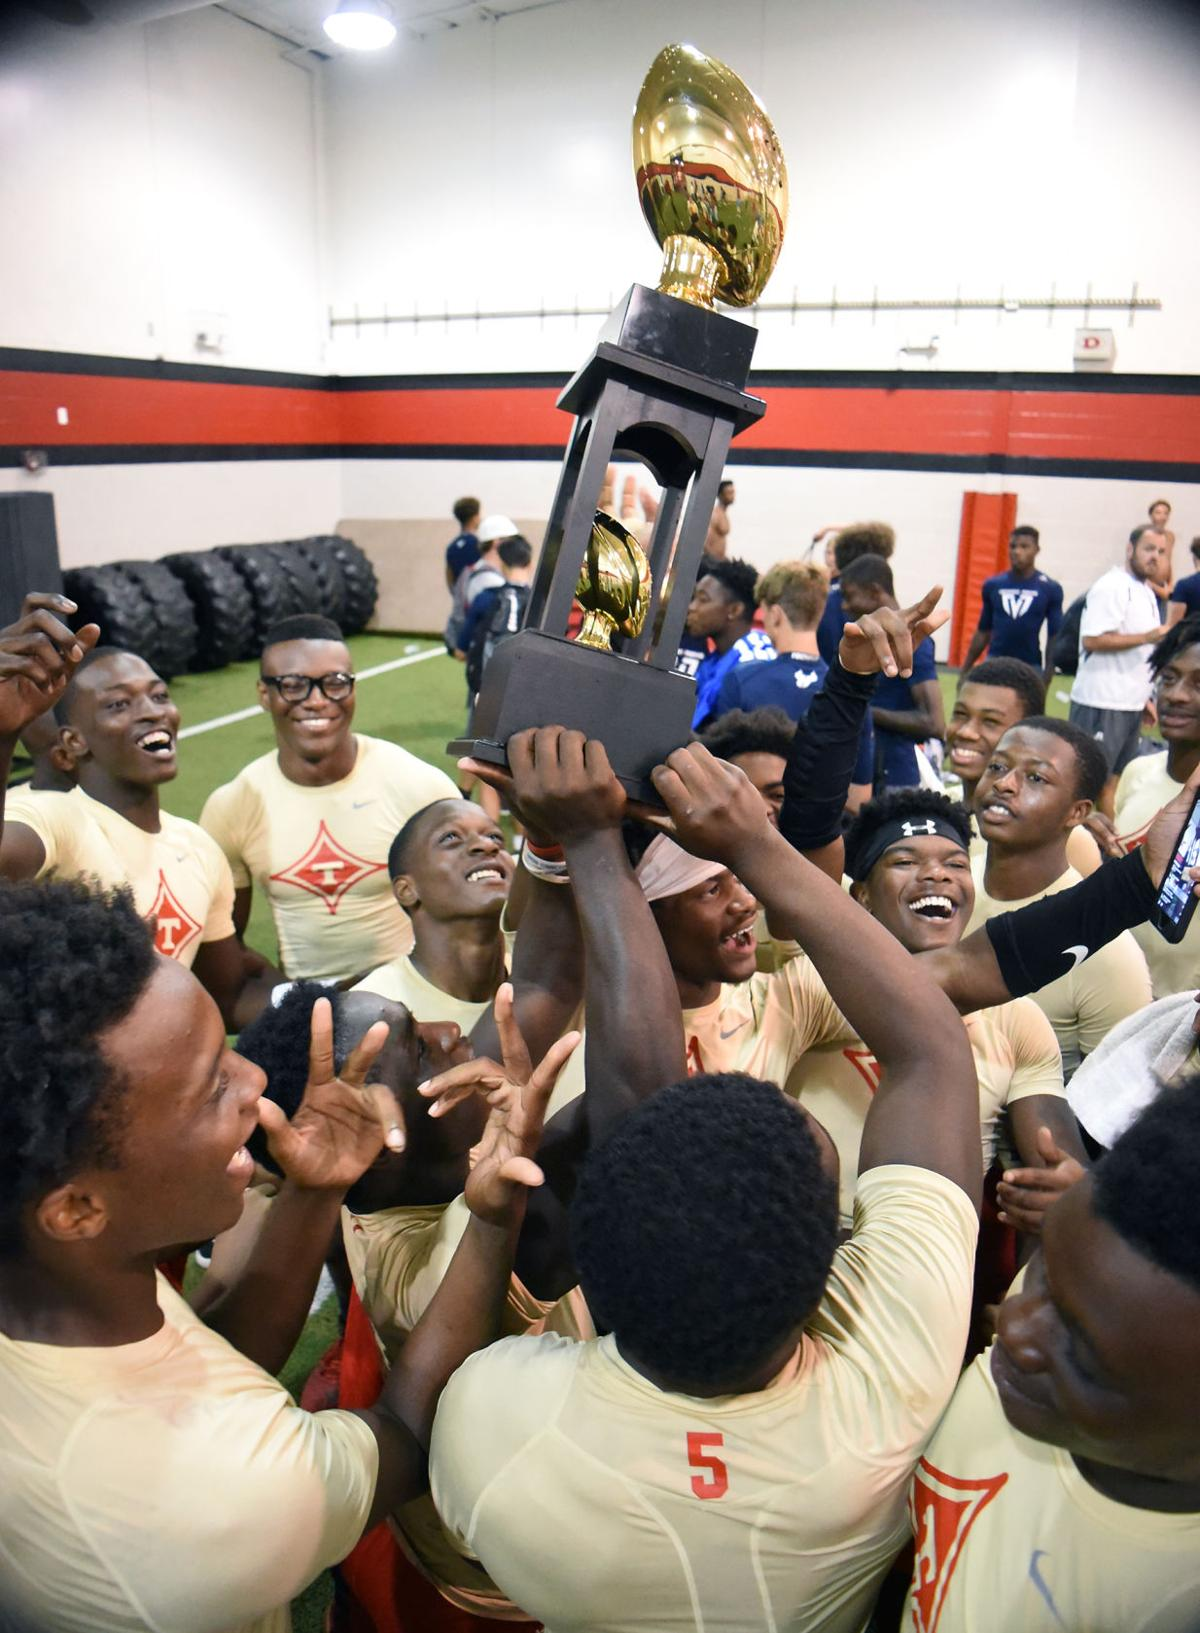 Thomasville football wins southeastern 7 on 7 championship